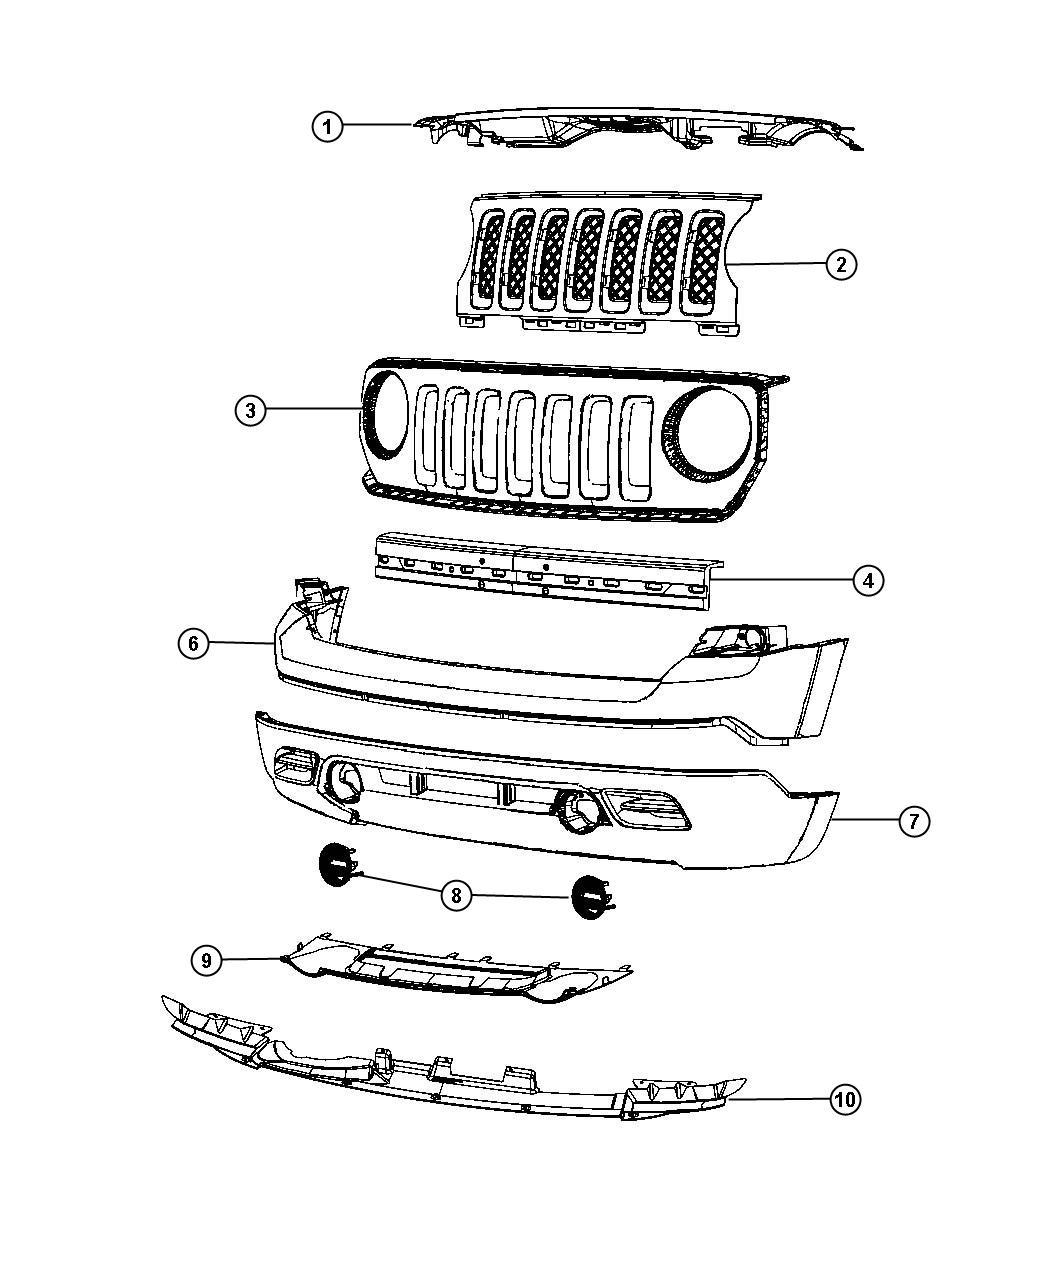 2013 Jeep Patriot Interior: 2013 Jeep Patriot Foam. Front Bumper Fascia. [mla] Or [mcy